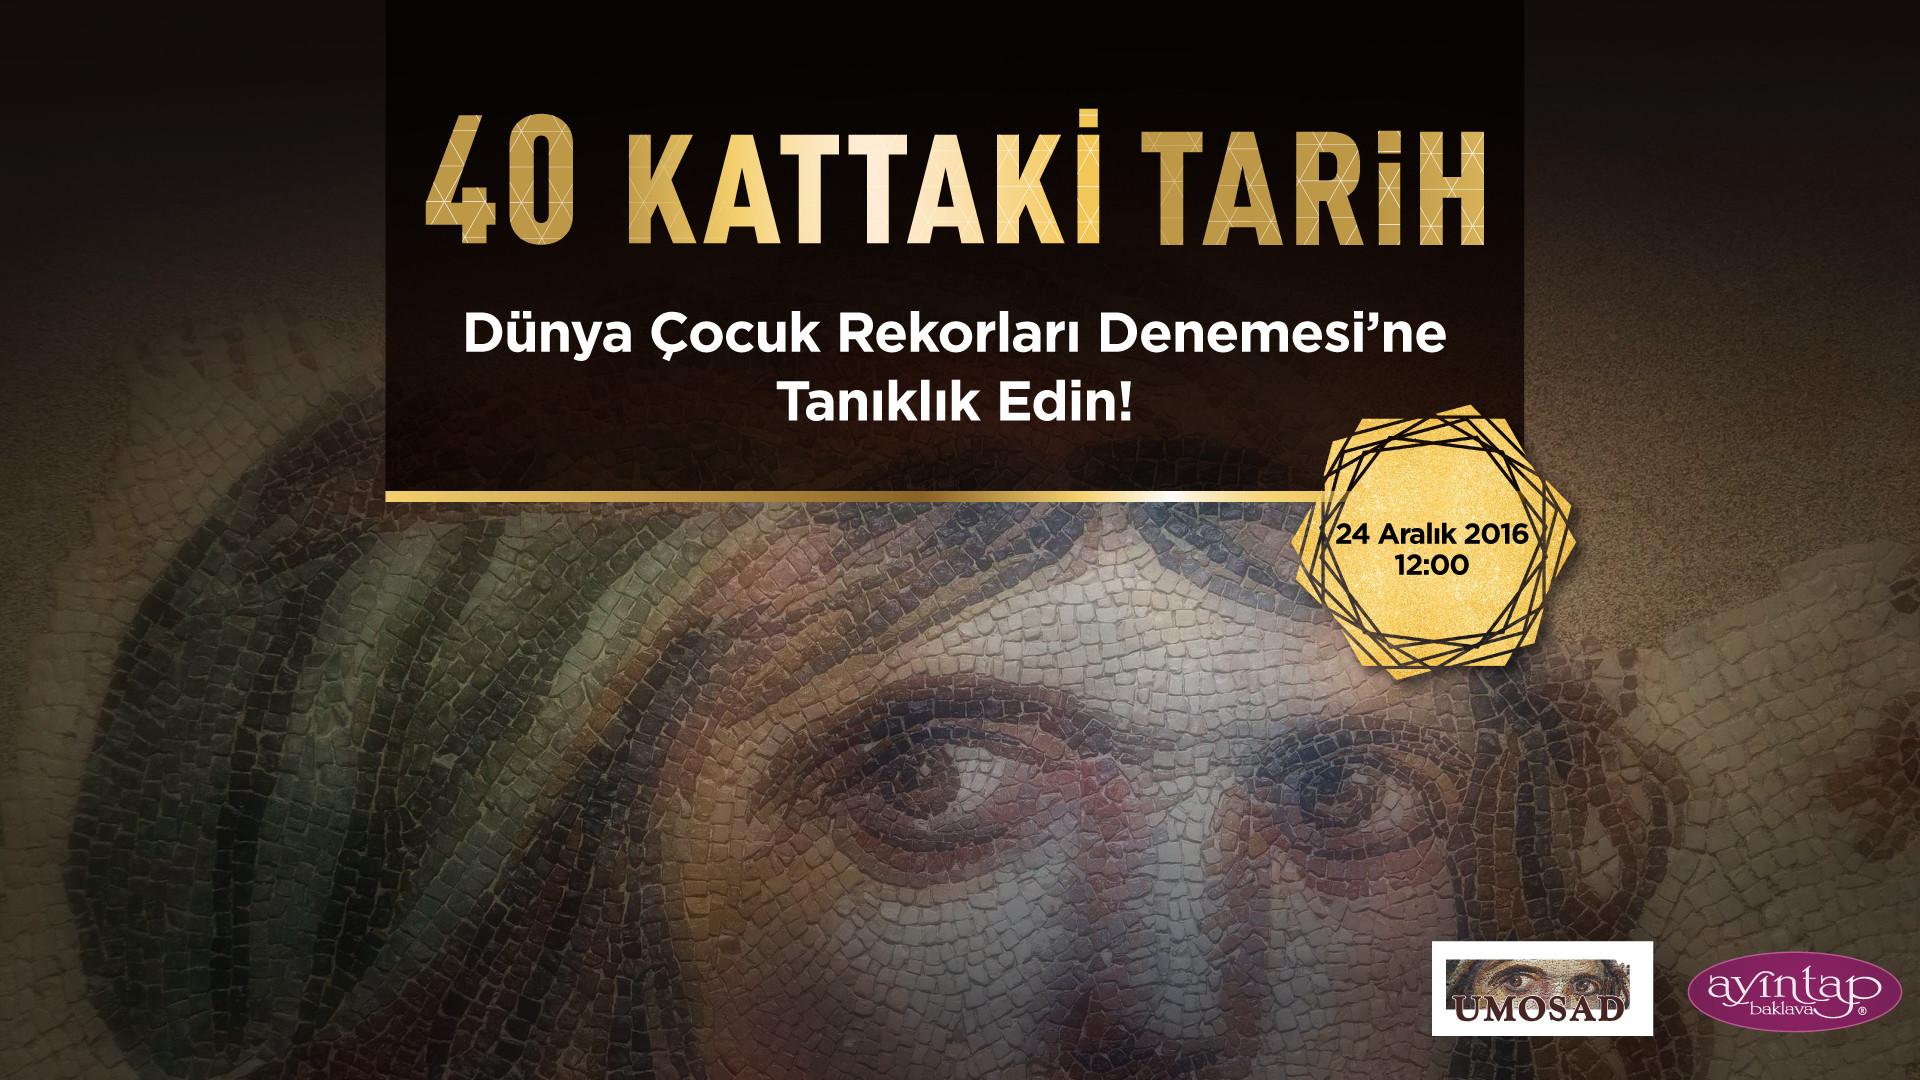 40 Kattaki Tarih